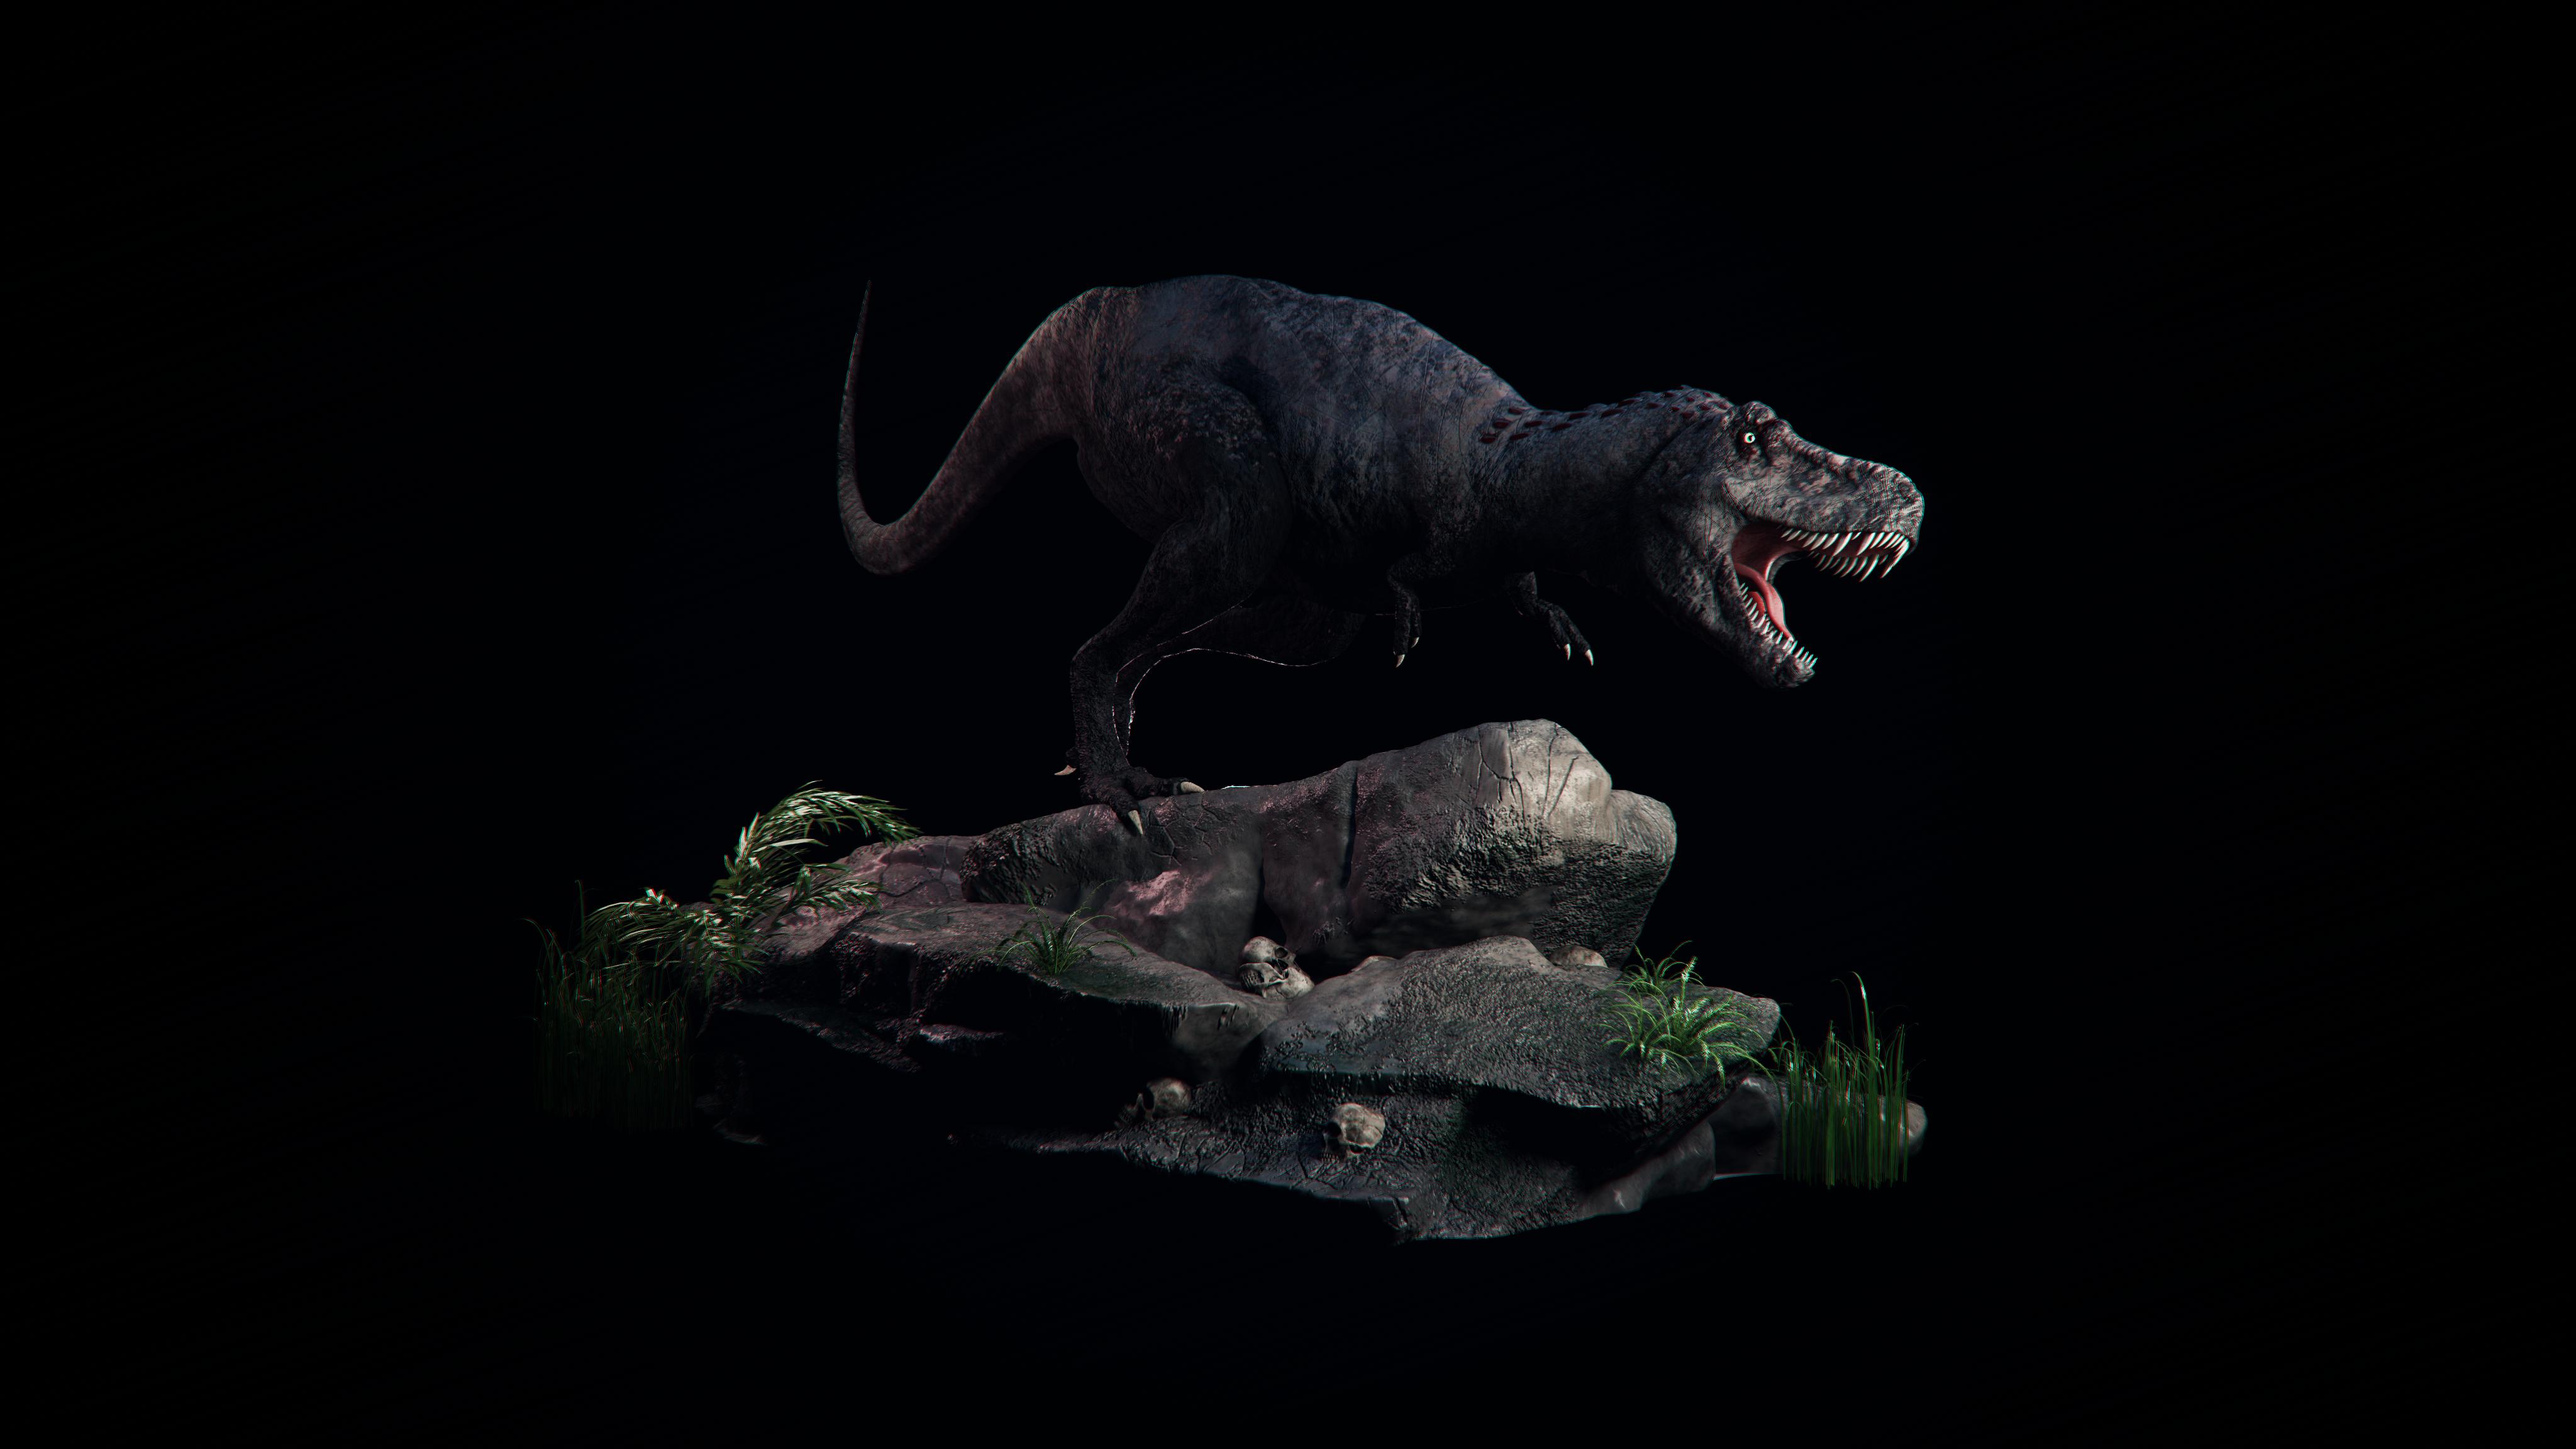 Tarbosaurus_image1_00000.png